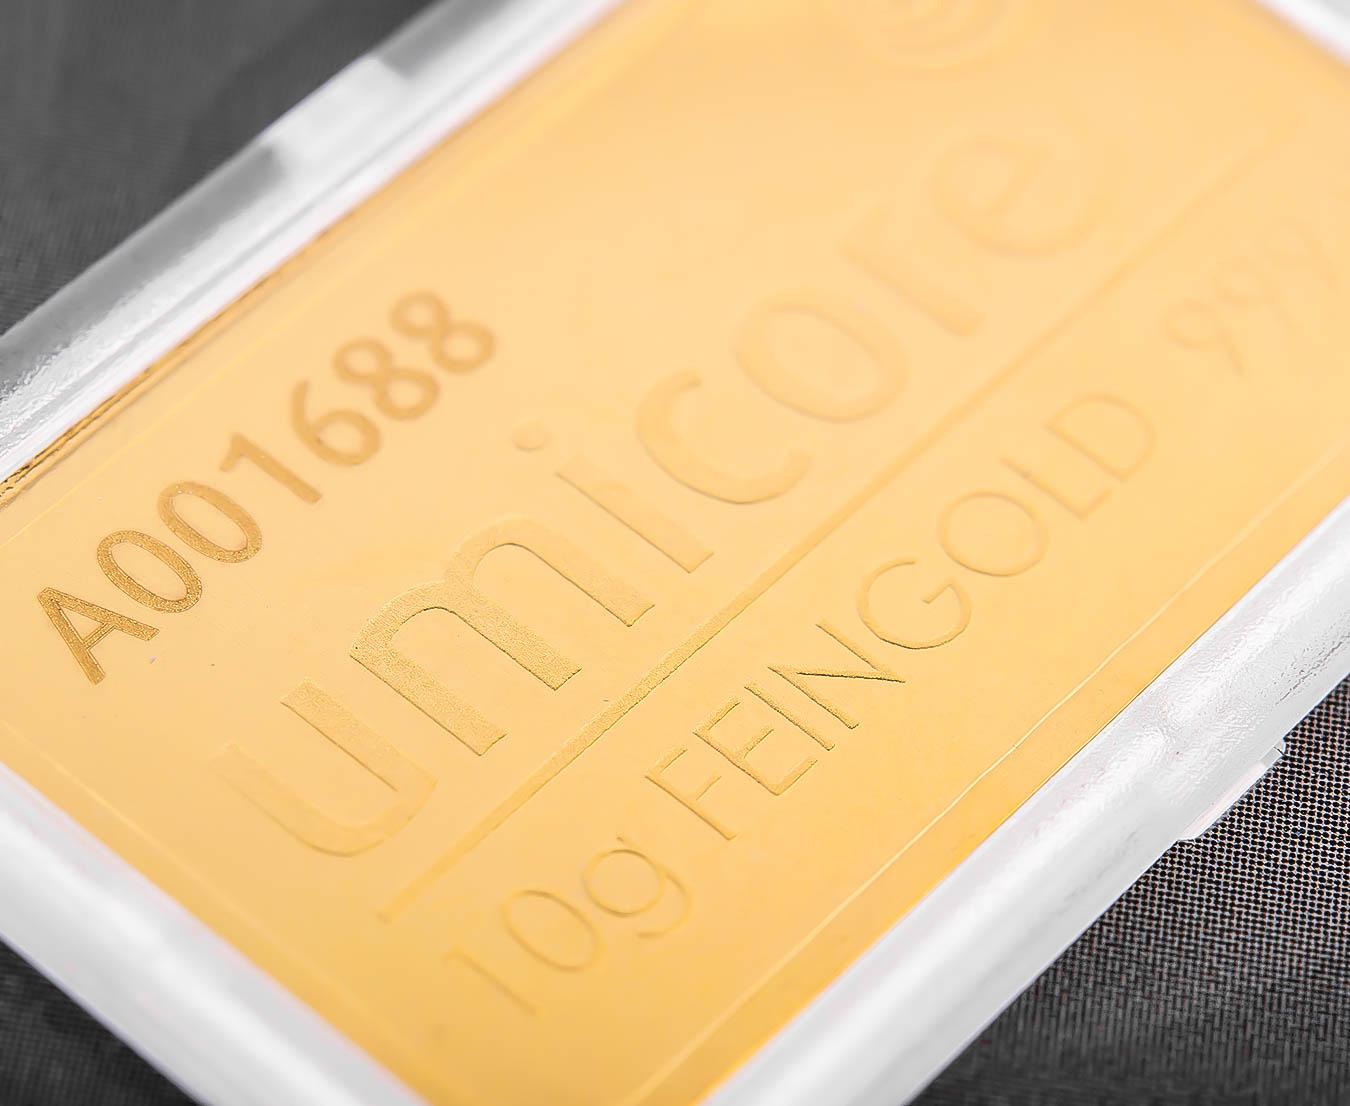 10g Umicore Gold Bars Bullionbypost From 423